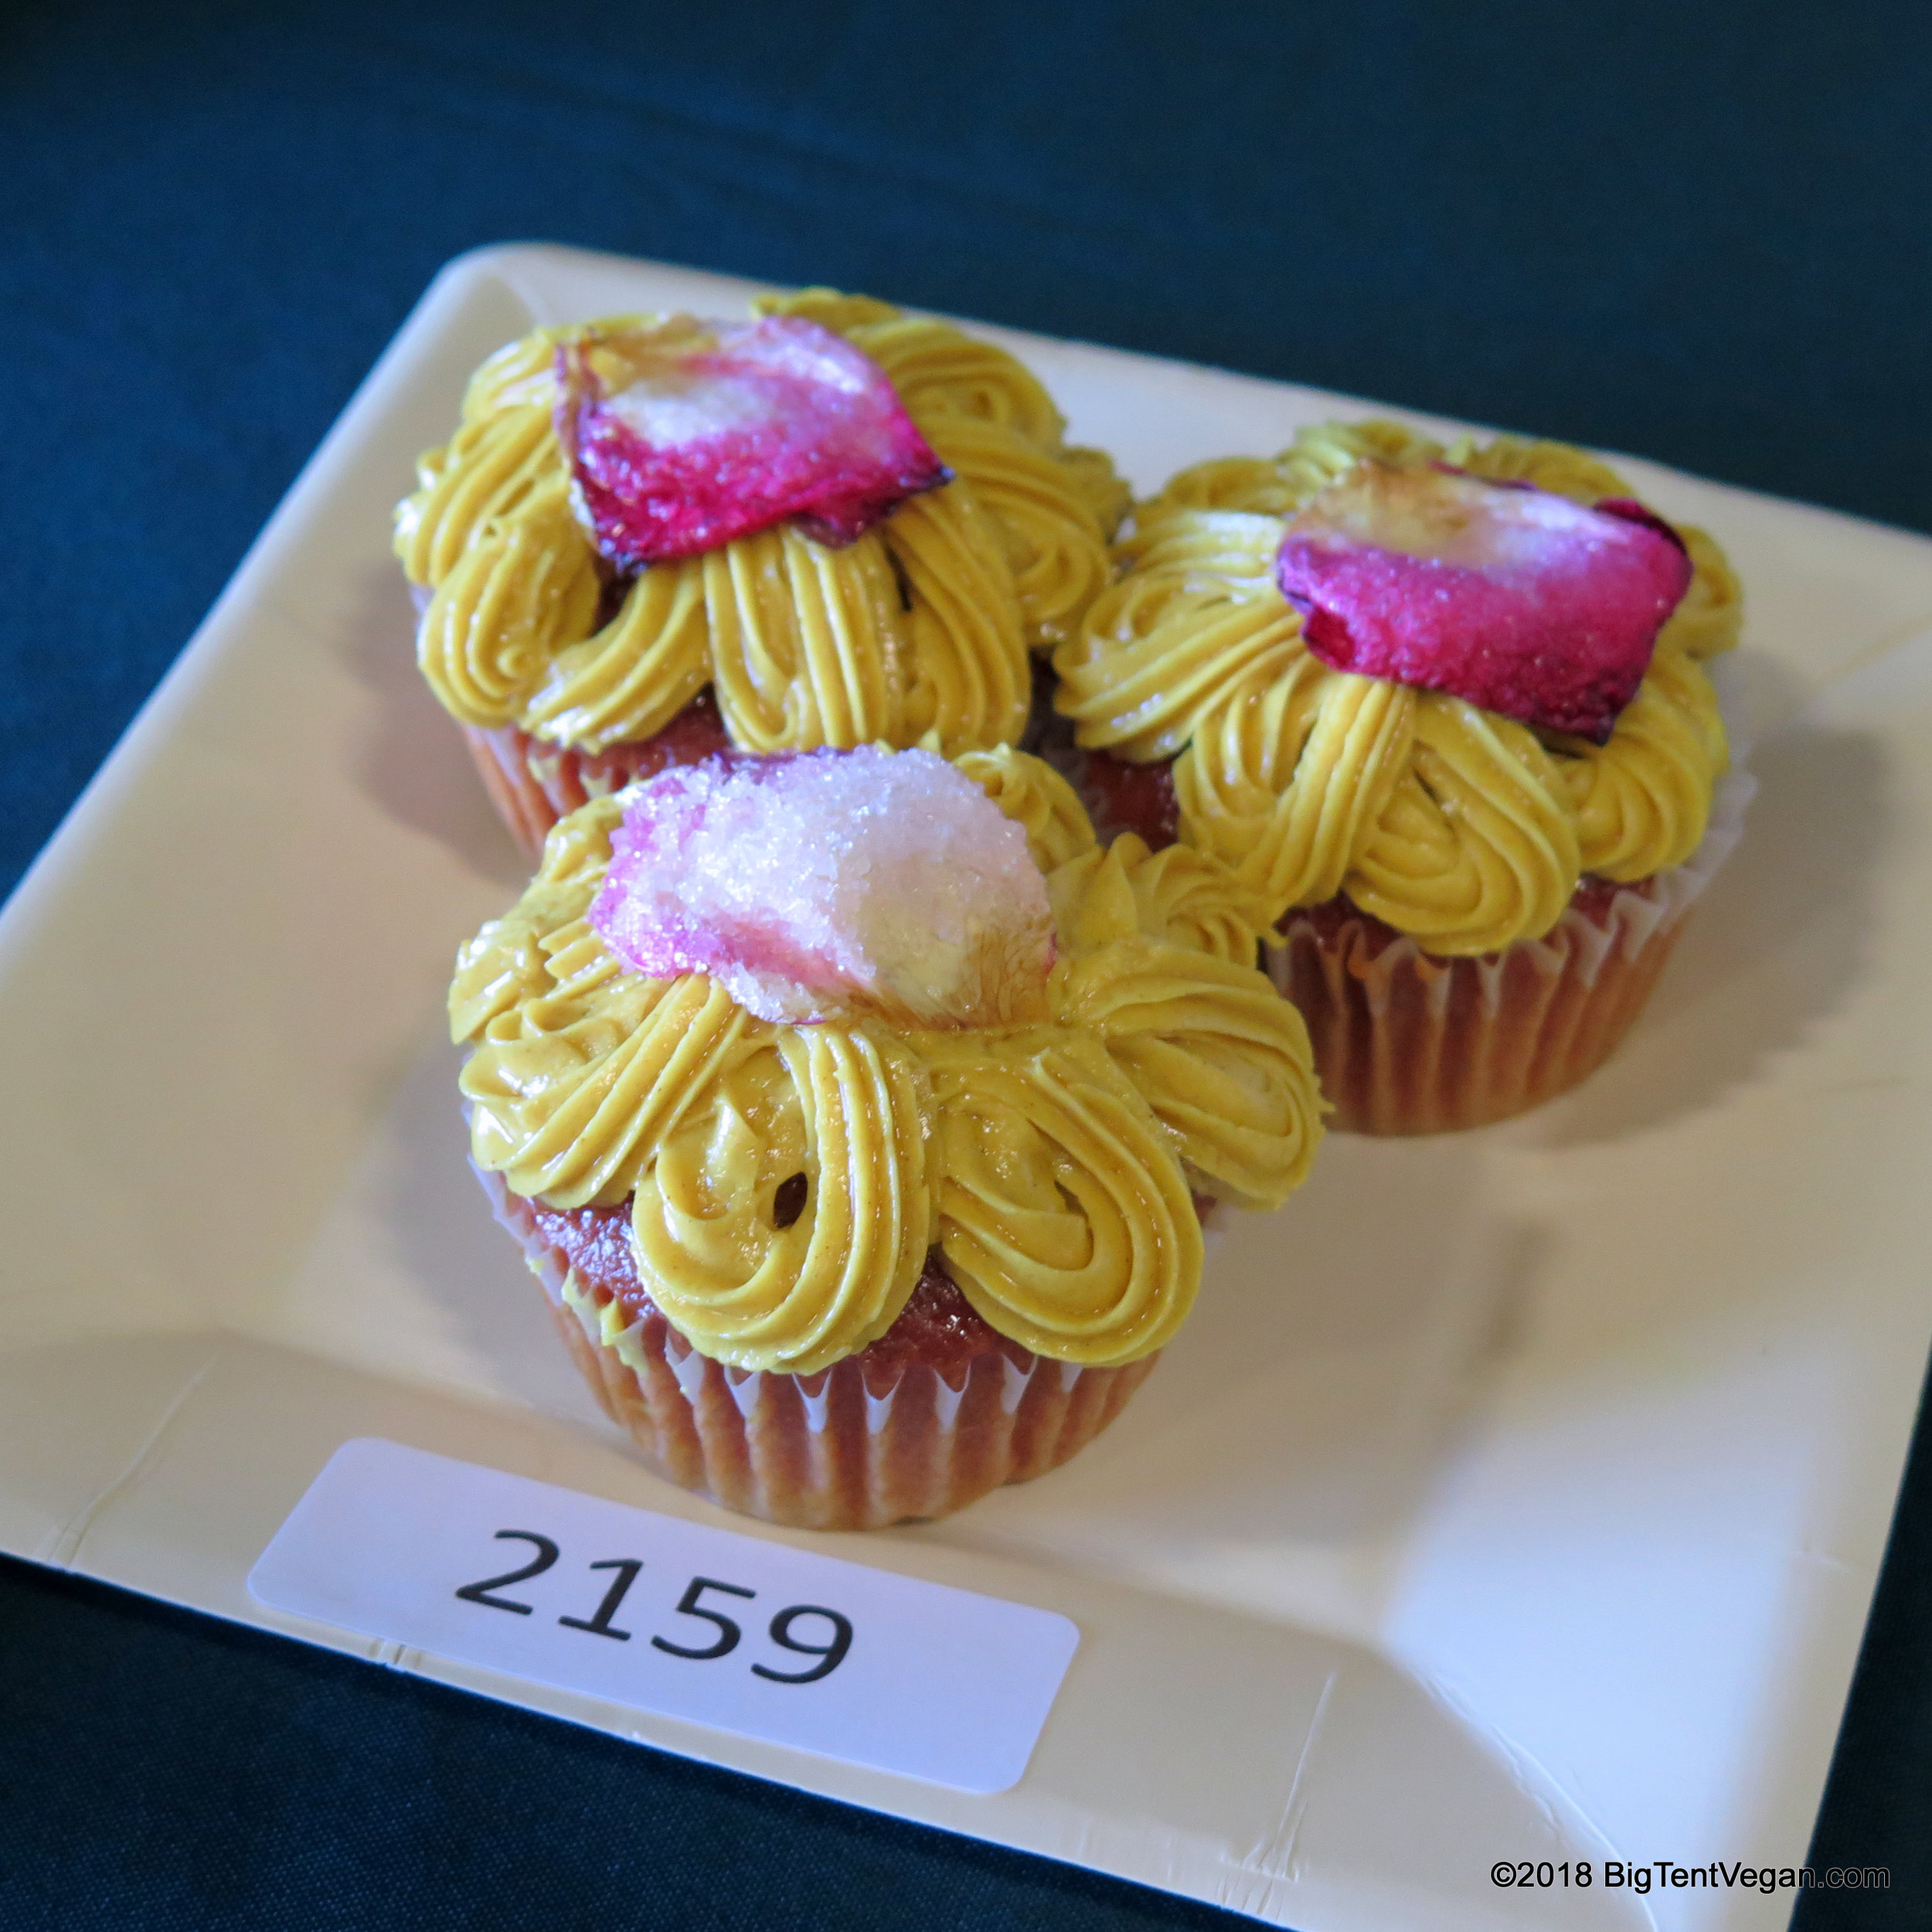 1st Place: Leiana Swadish     Golden Milk Cupcakes